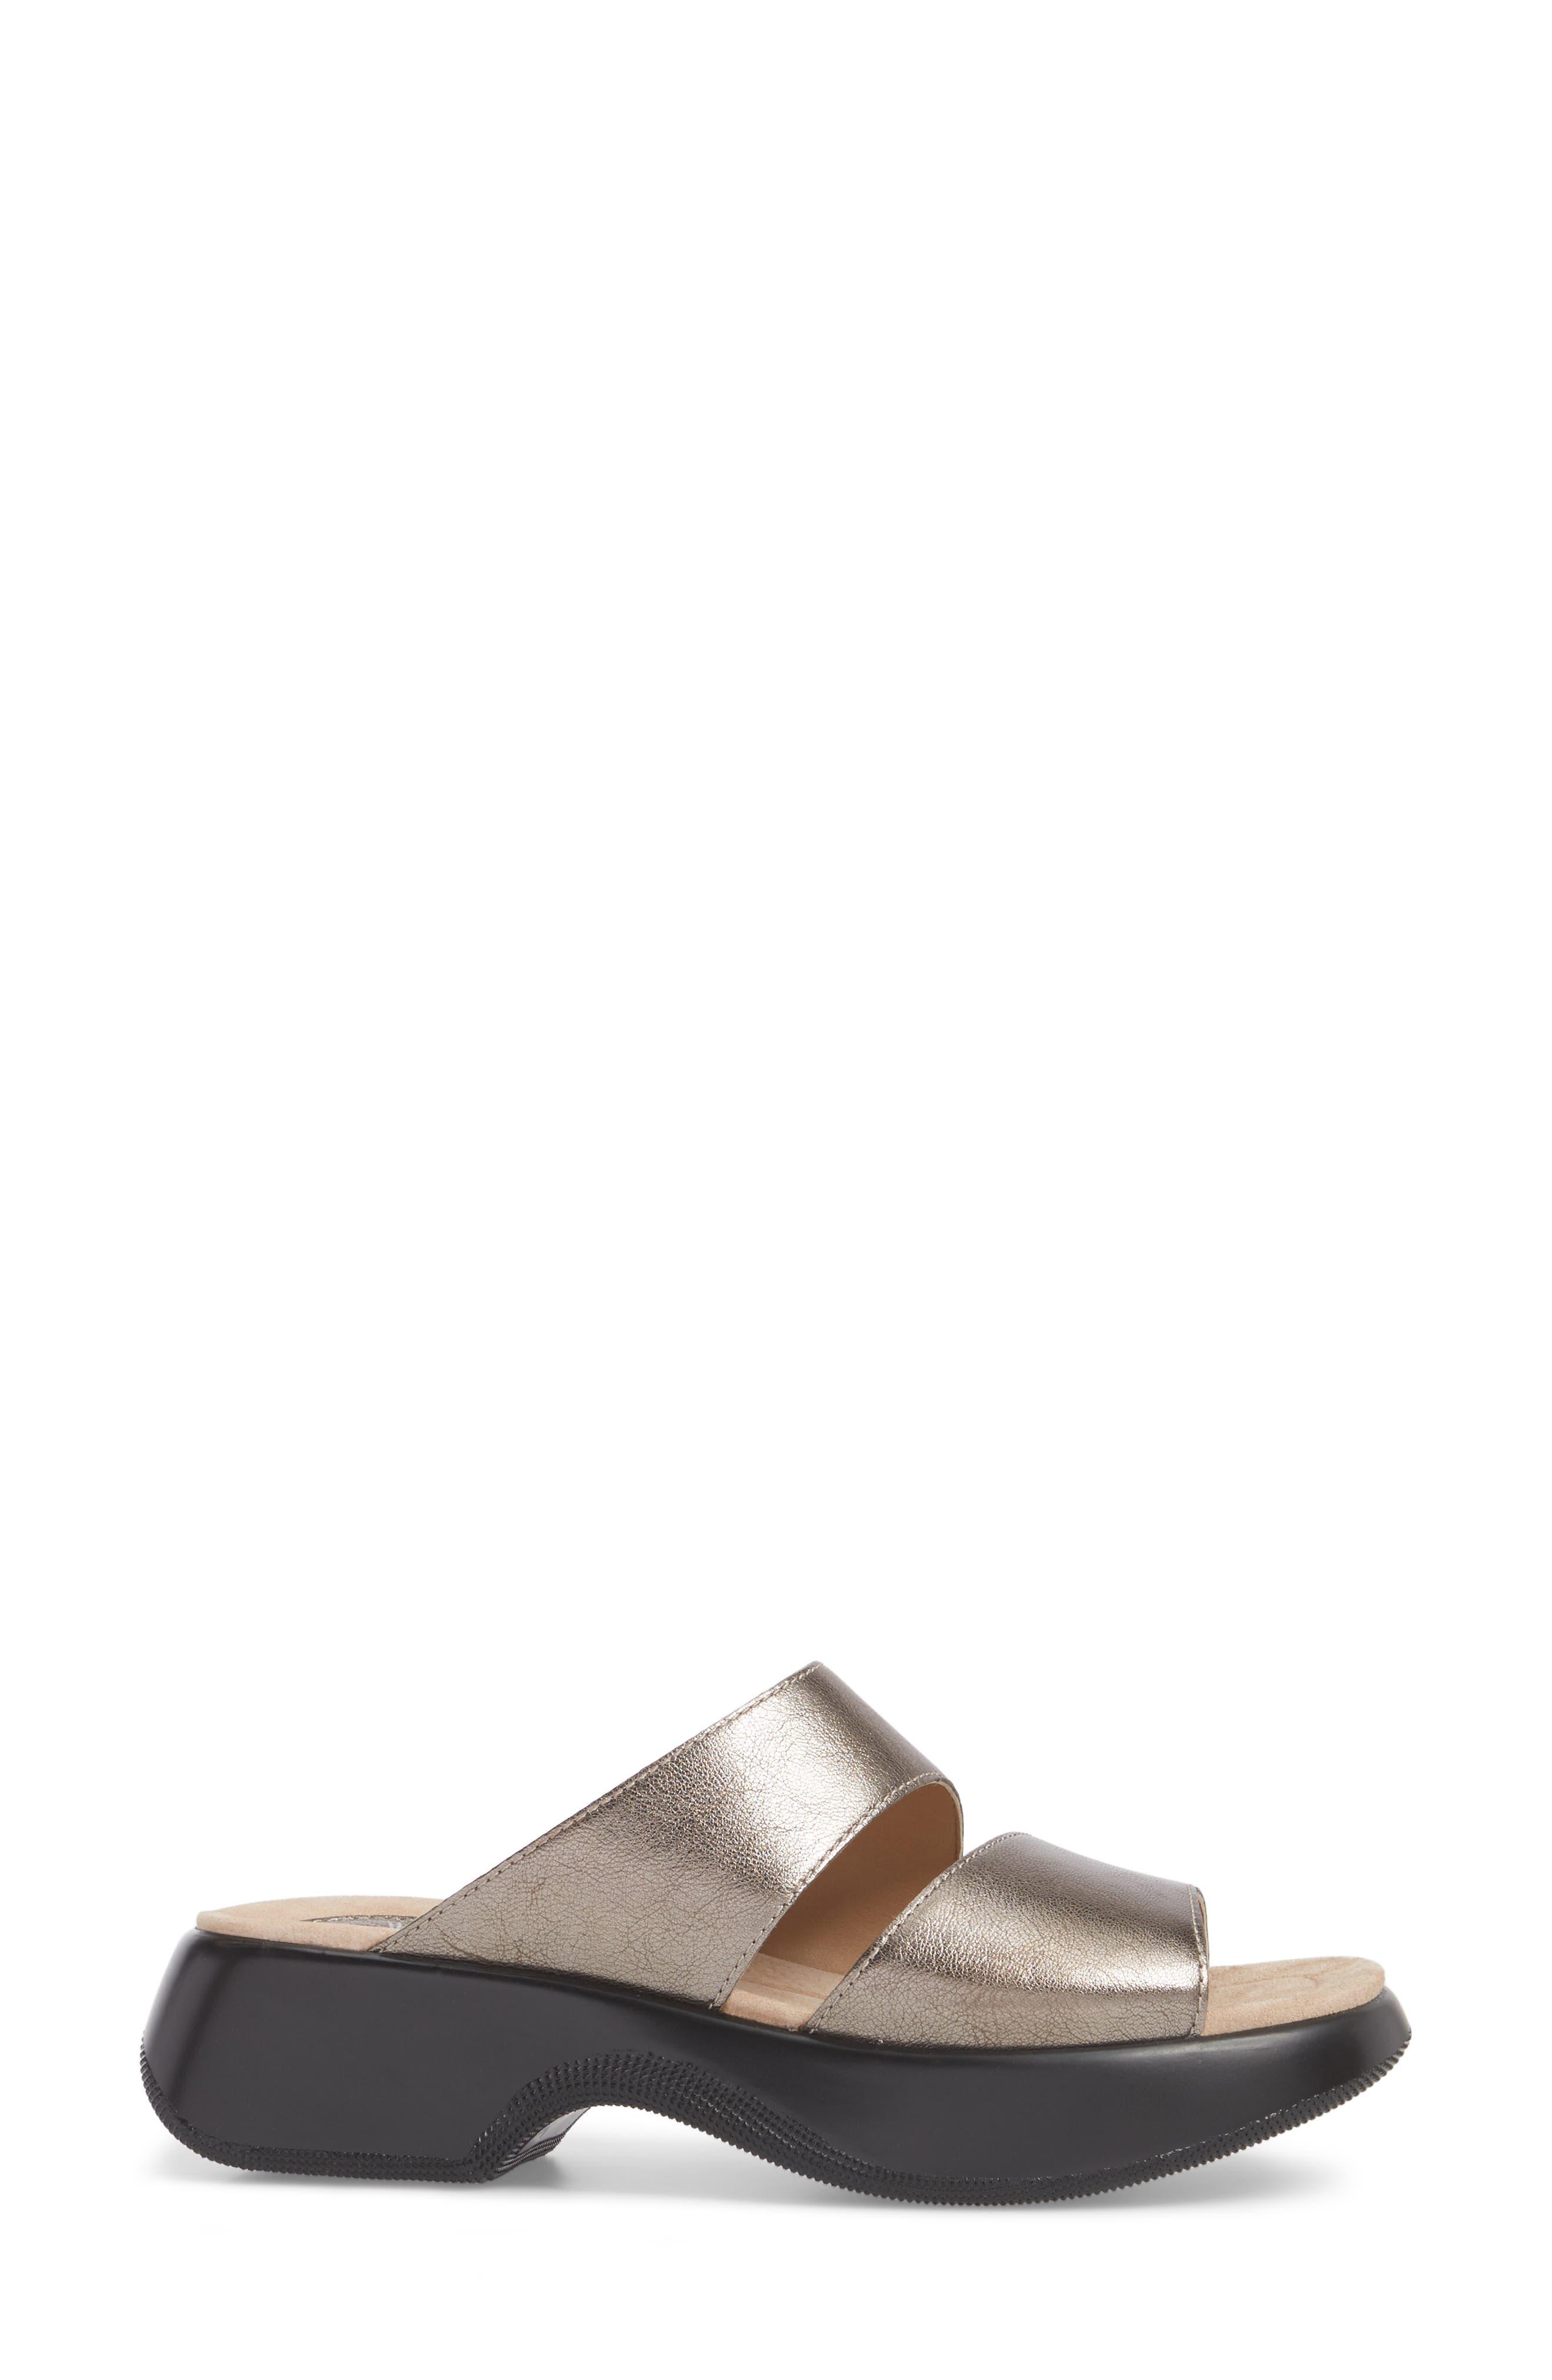 Lana Slide Sandal,                             Alternate thumbnail 3, color,                             Pewter Leather